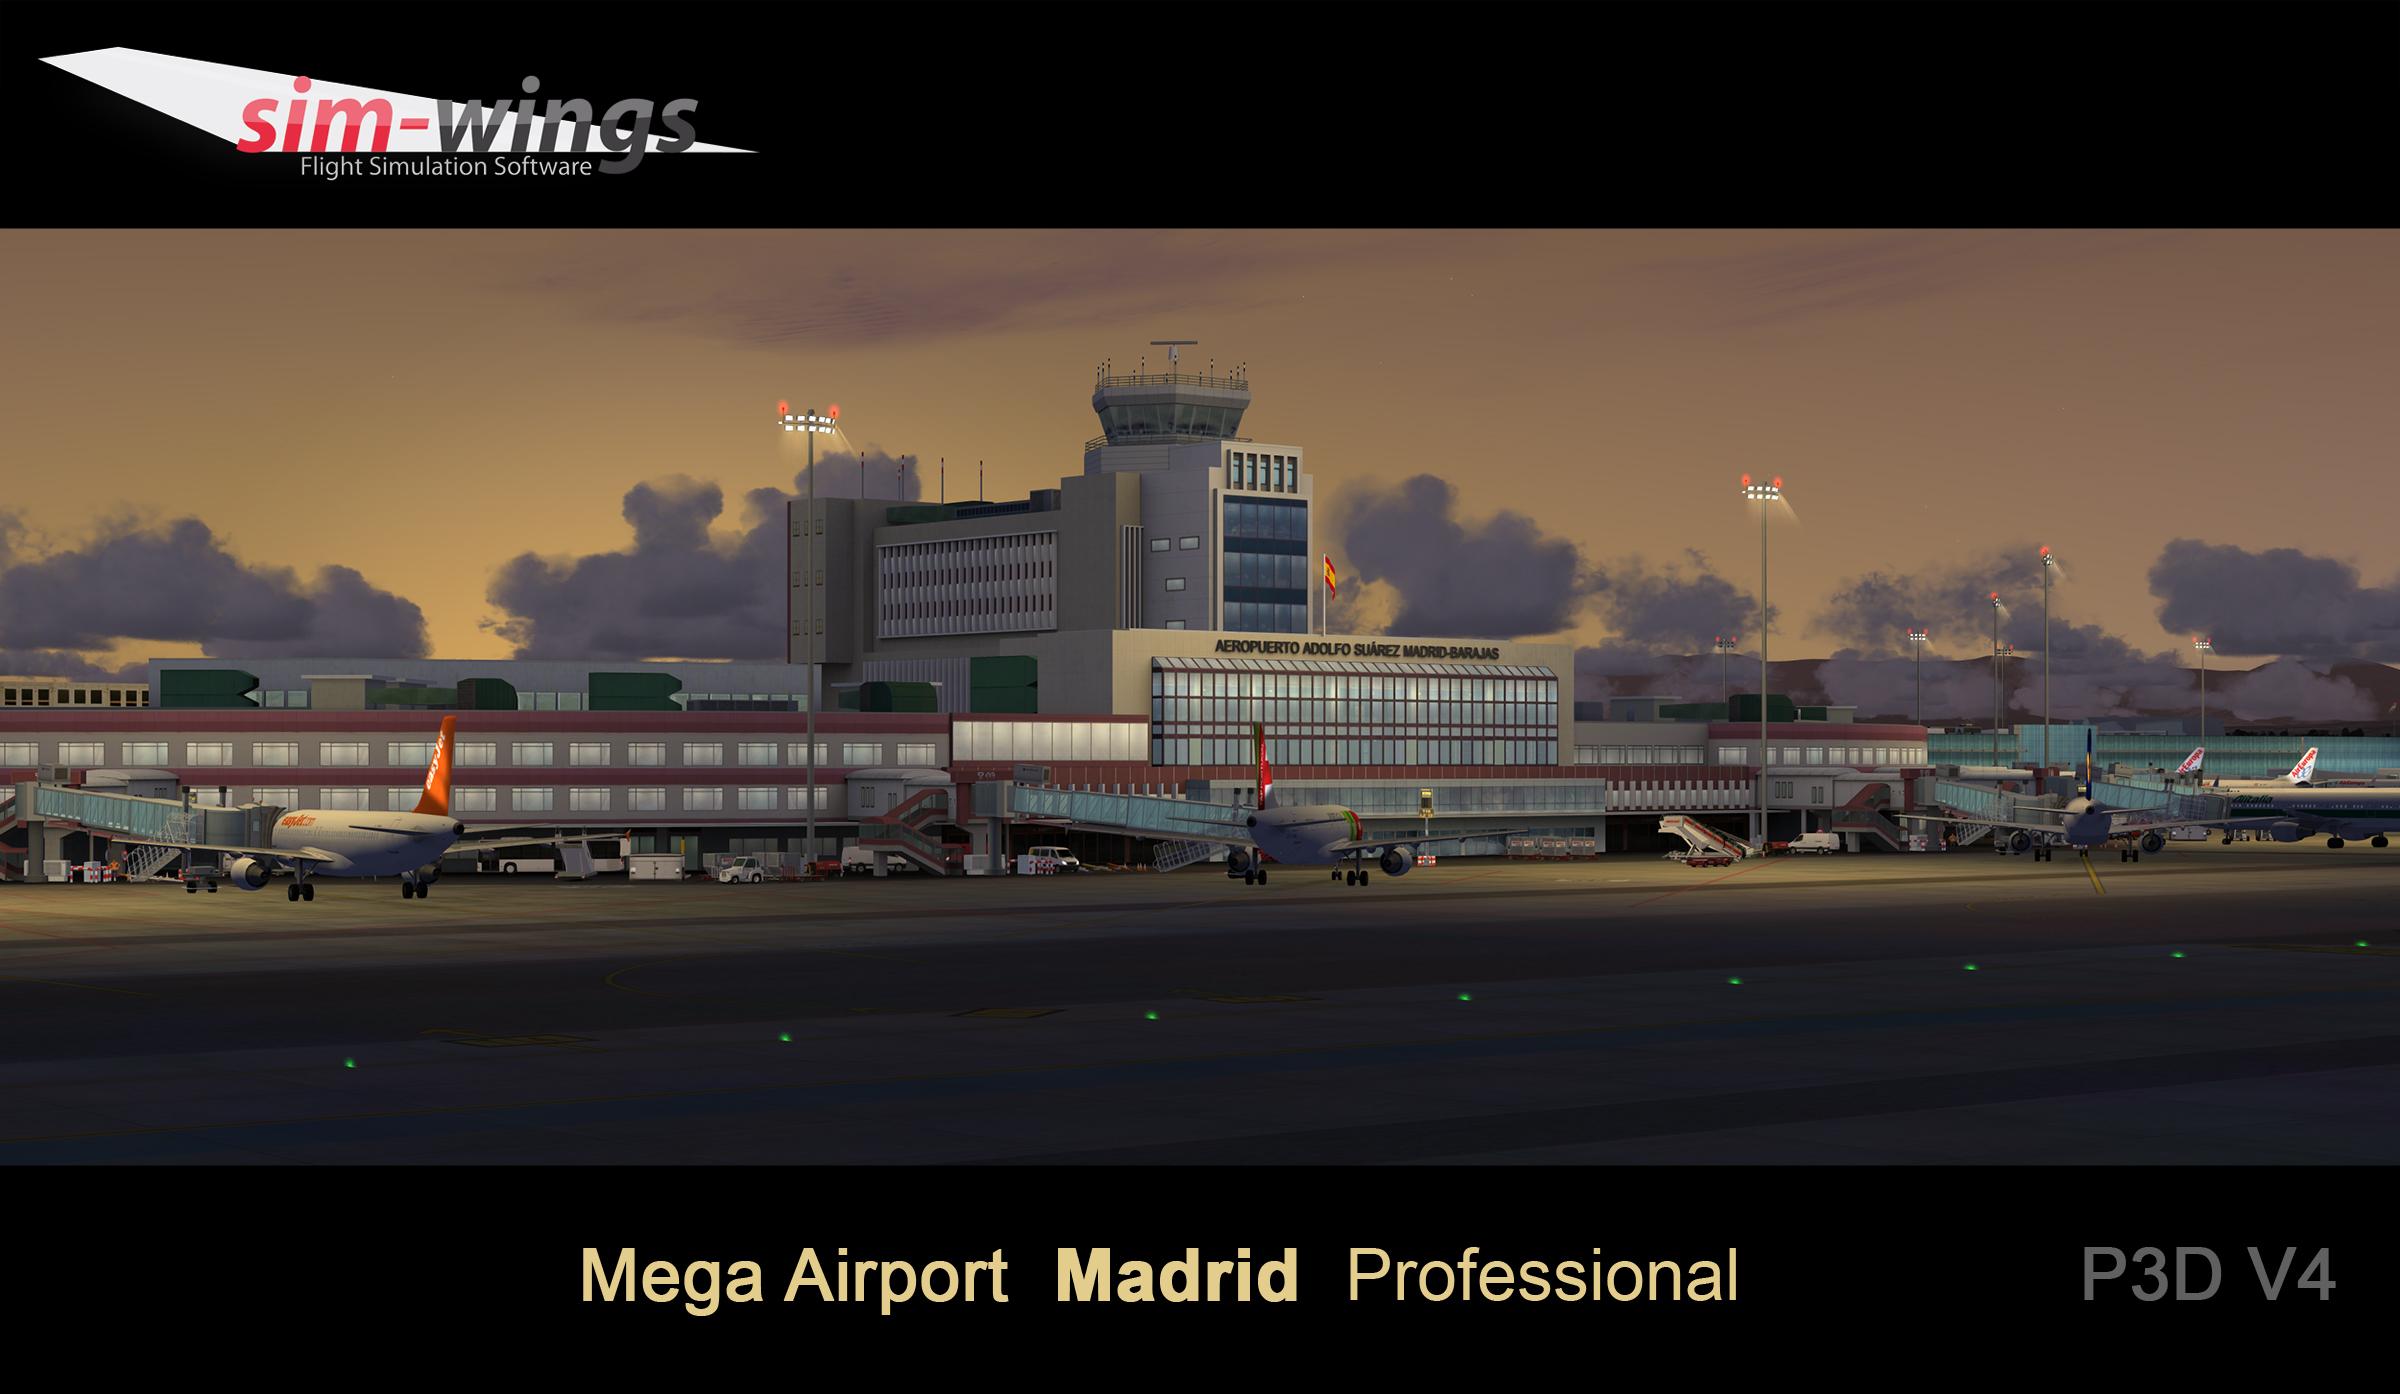 Mega Airport Madrid professional